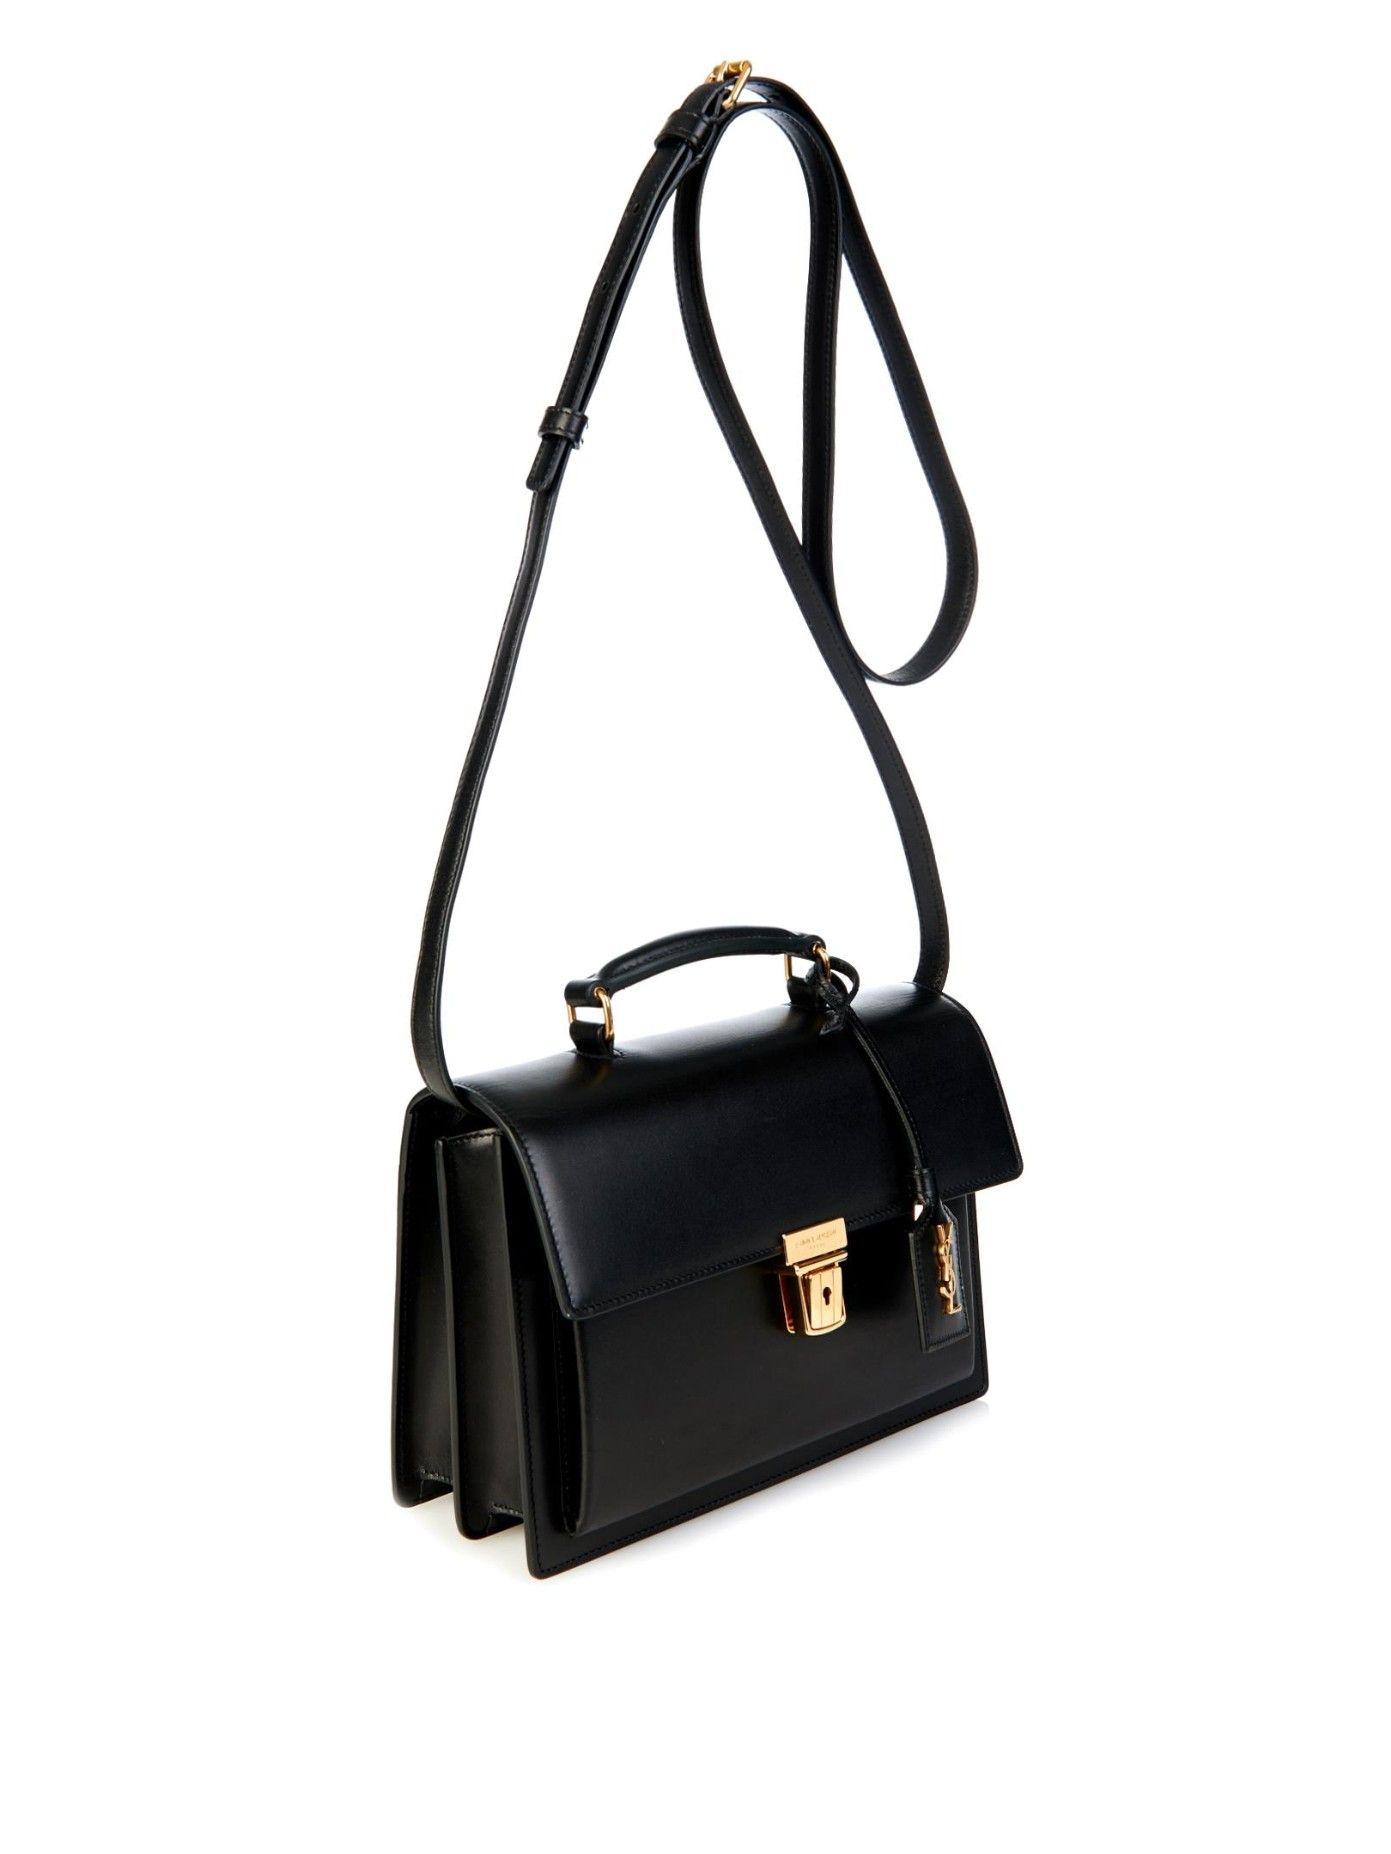 High School Medium Leather Shoulder Bag Saint Lau Matchesfashion Com Uk